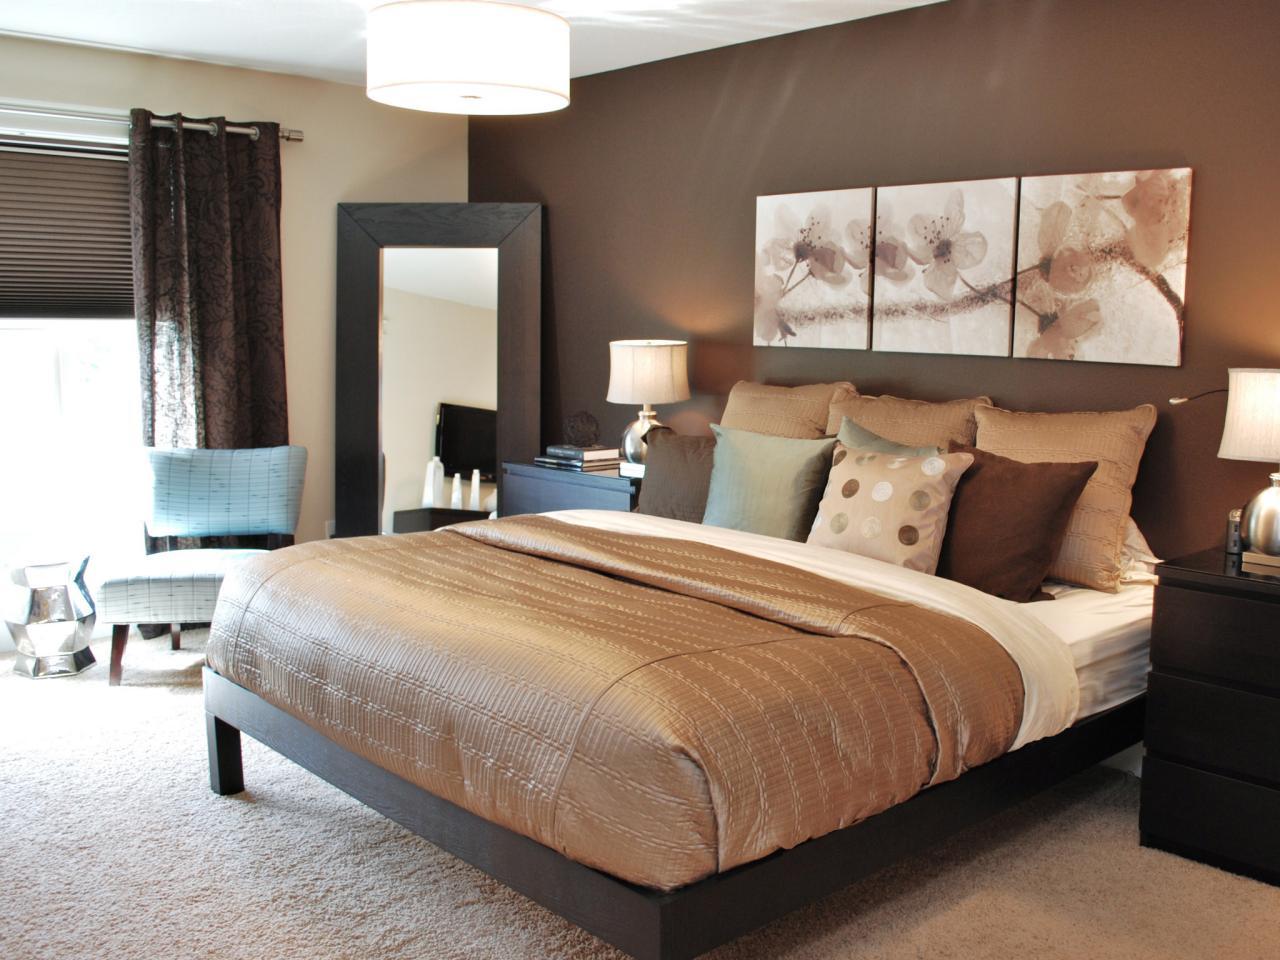 Impressive neutral bedroom